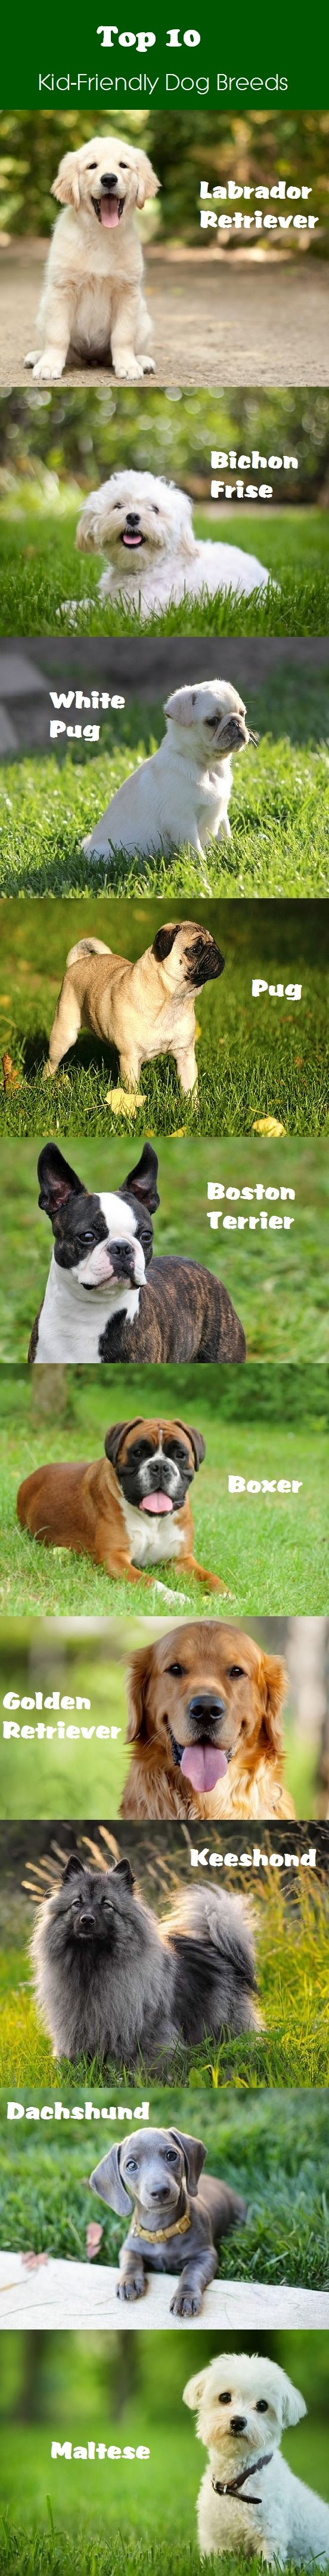 What Kind Of Dog Should We Get The Best Dogs For Kids Dog Breeds Child Friendly Dogs Best Dog Breeds